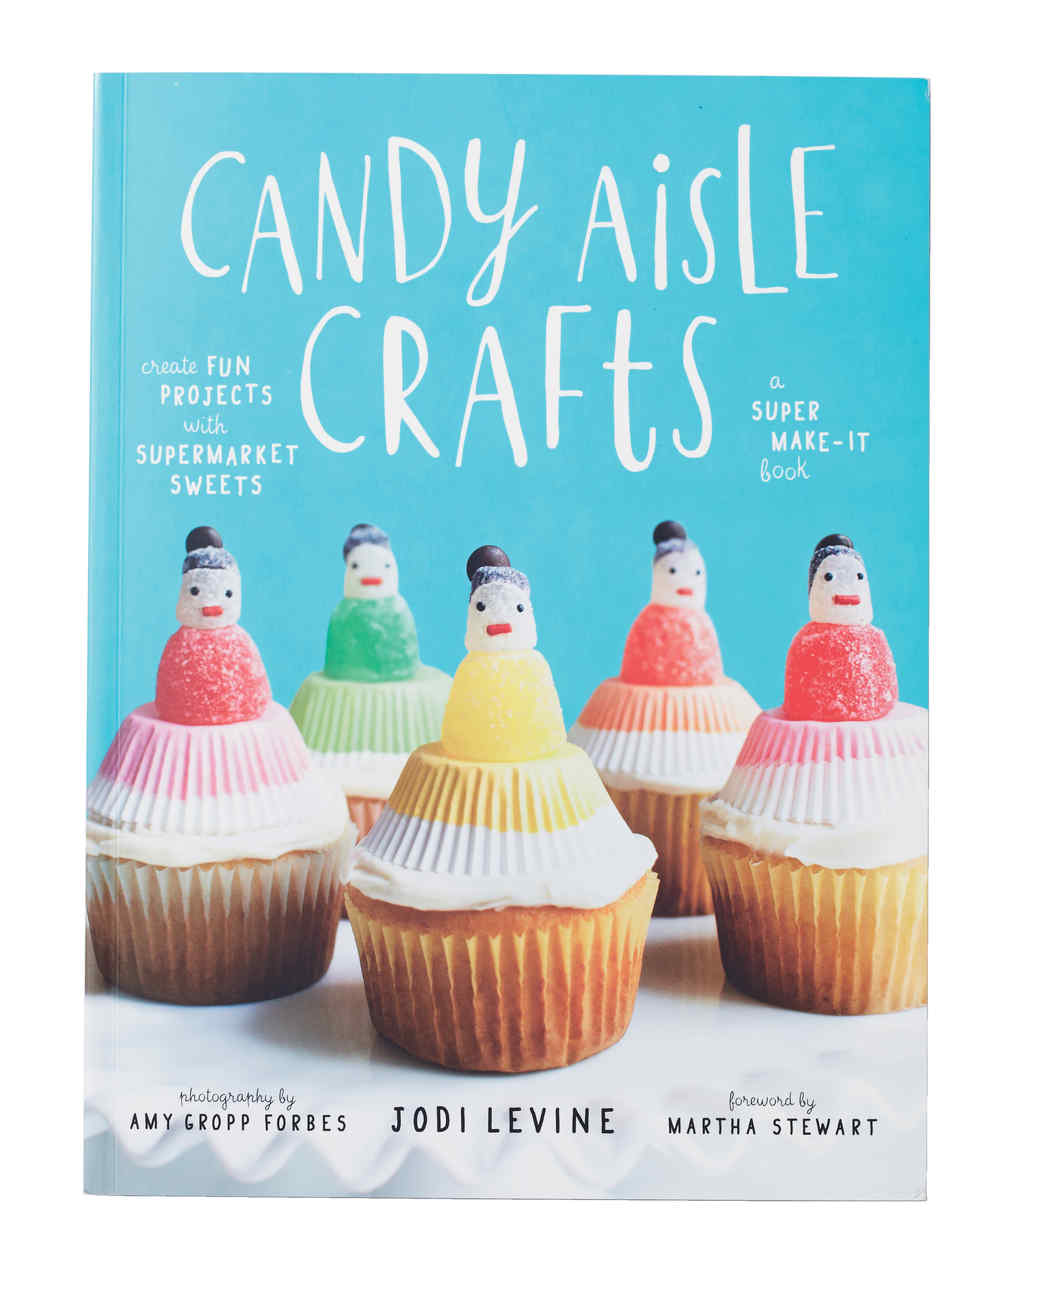 book-candy-aisle-crafts-overhead-093-d111535.jpg